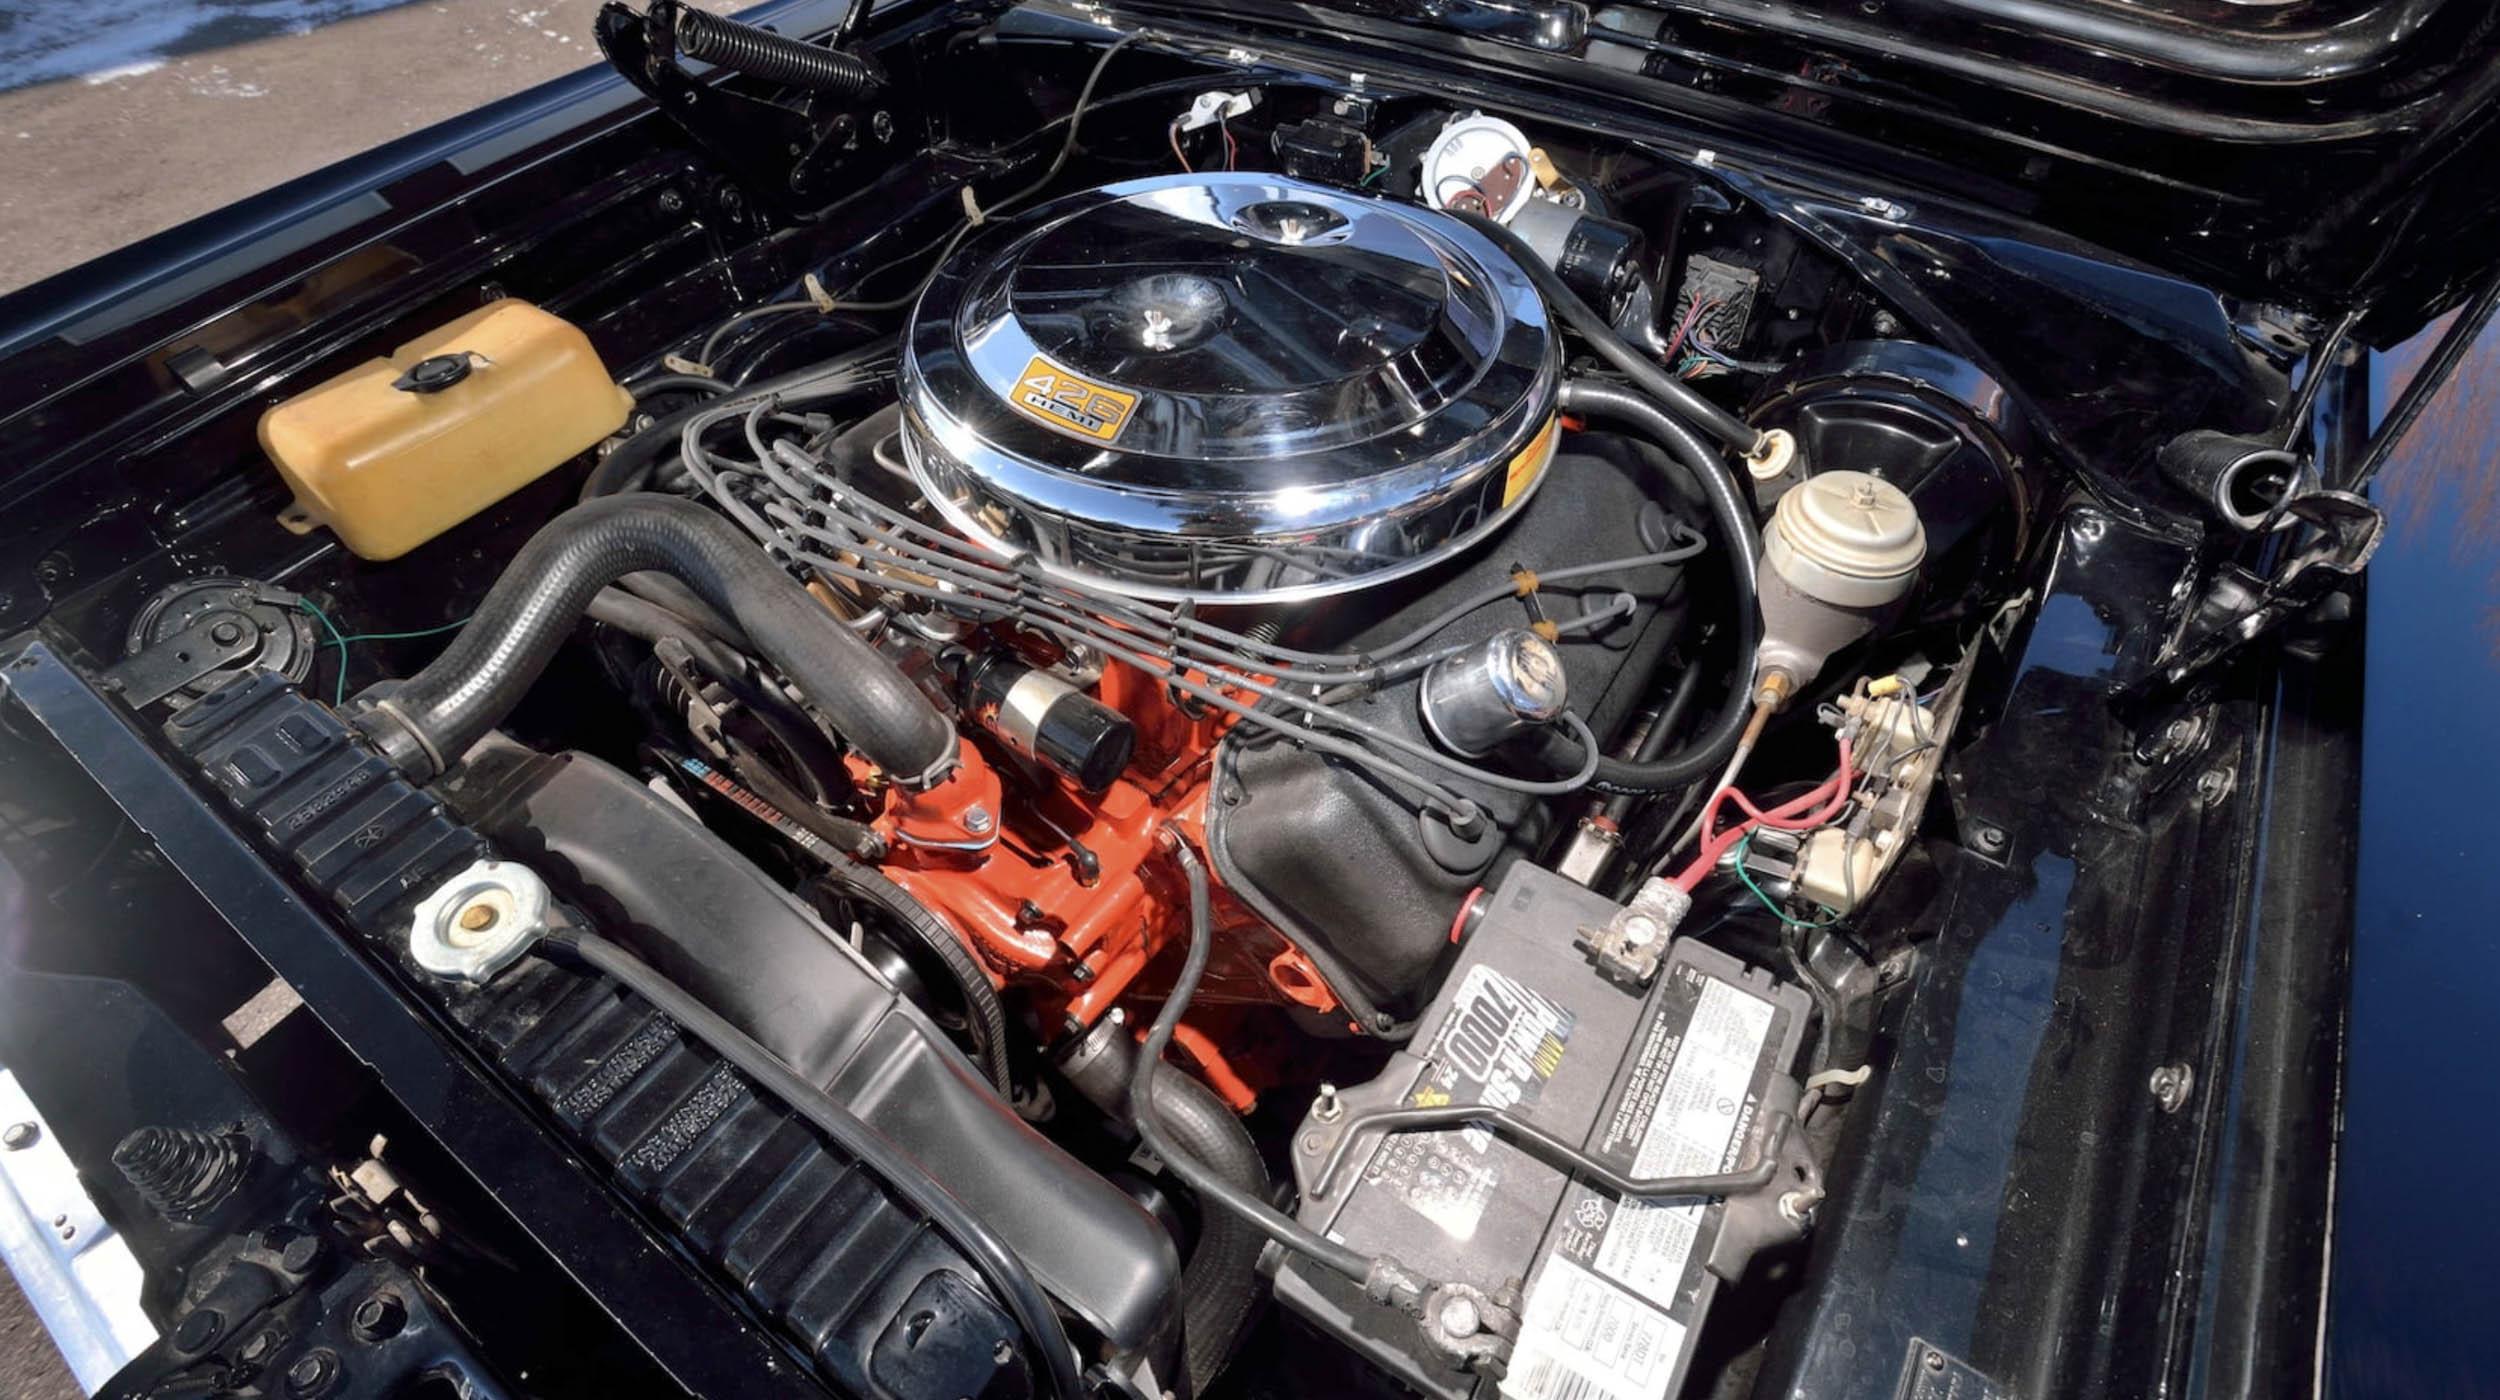 1966 Plymouth Belvedere sedan 426 Hemi